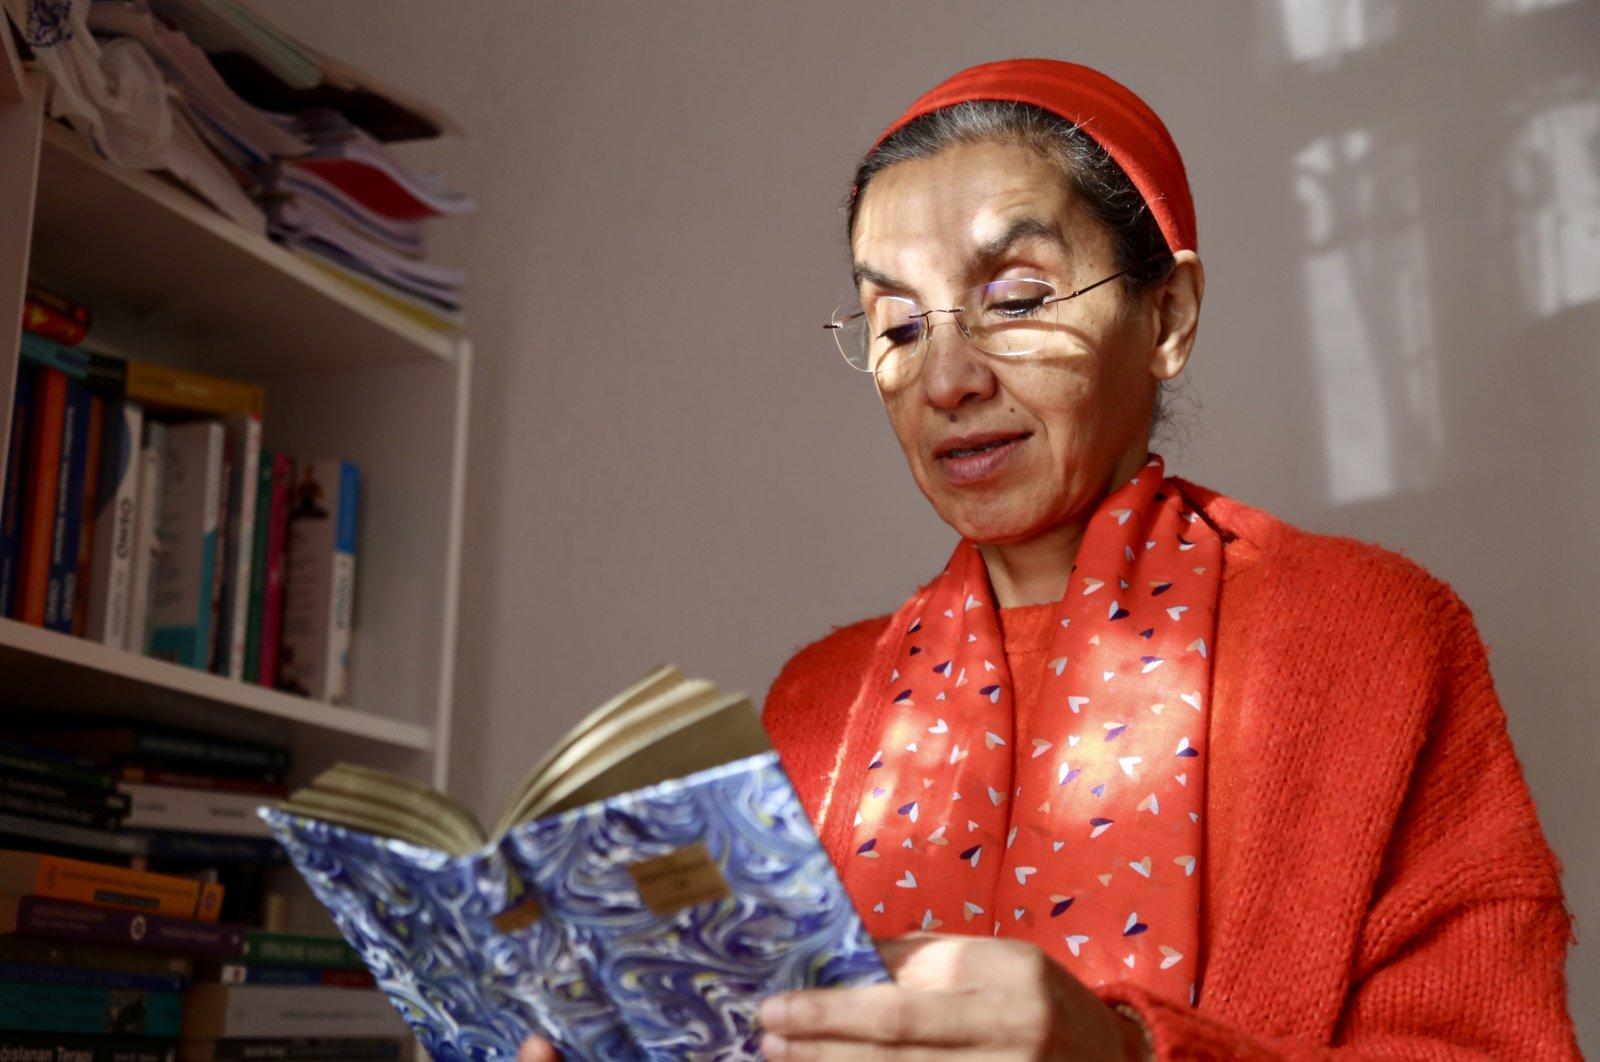 Swamini Samvidananda Saraswati reads a book by Rumi in her home, in Konya, Turkey, Dec. 17, 2020. (AA Photo)